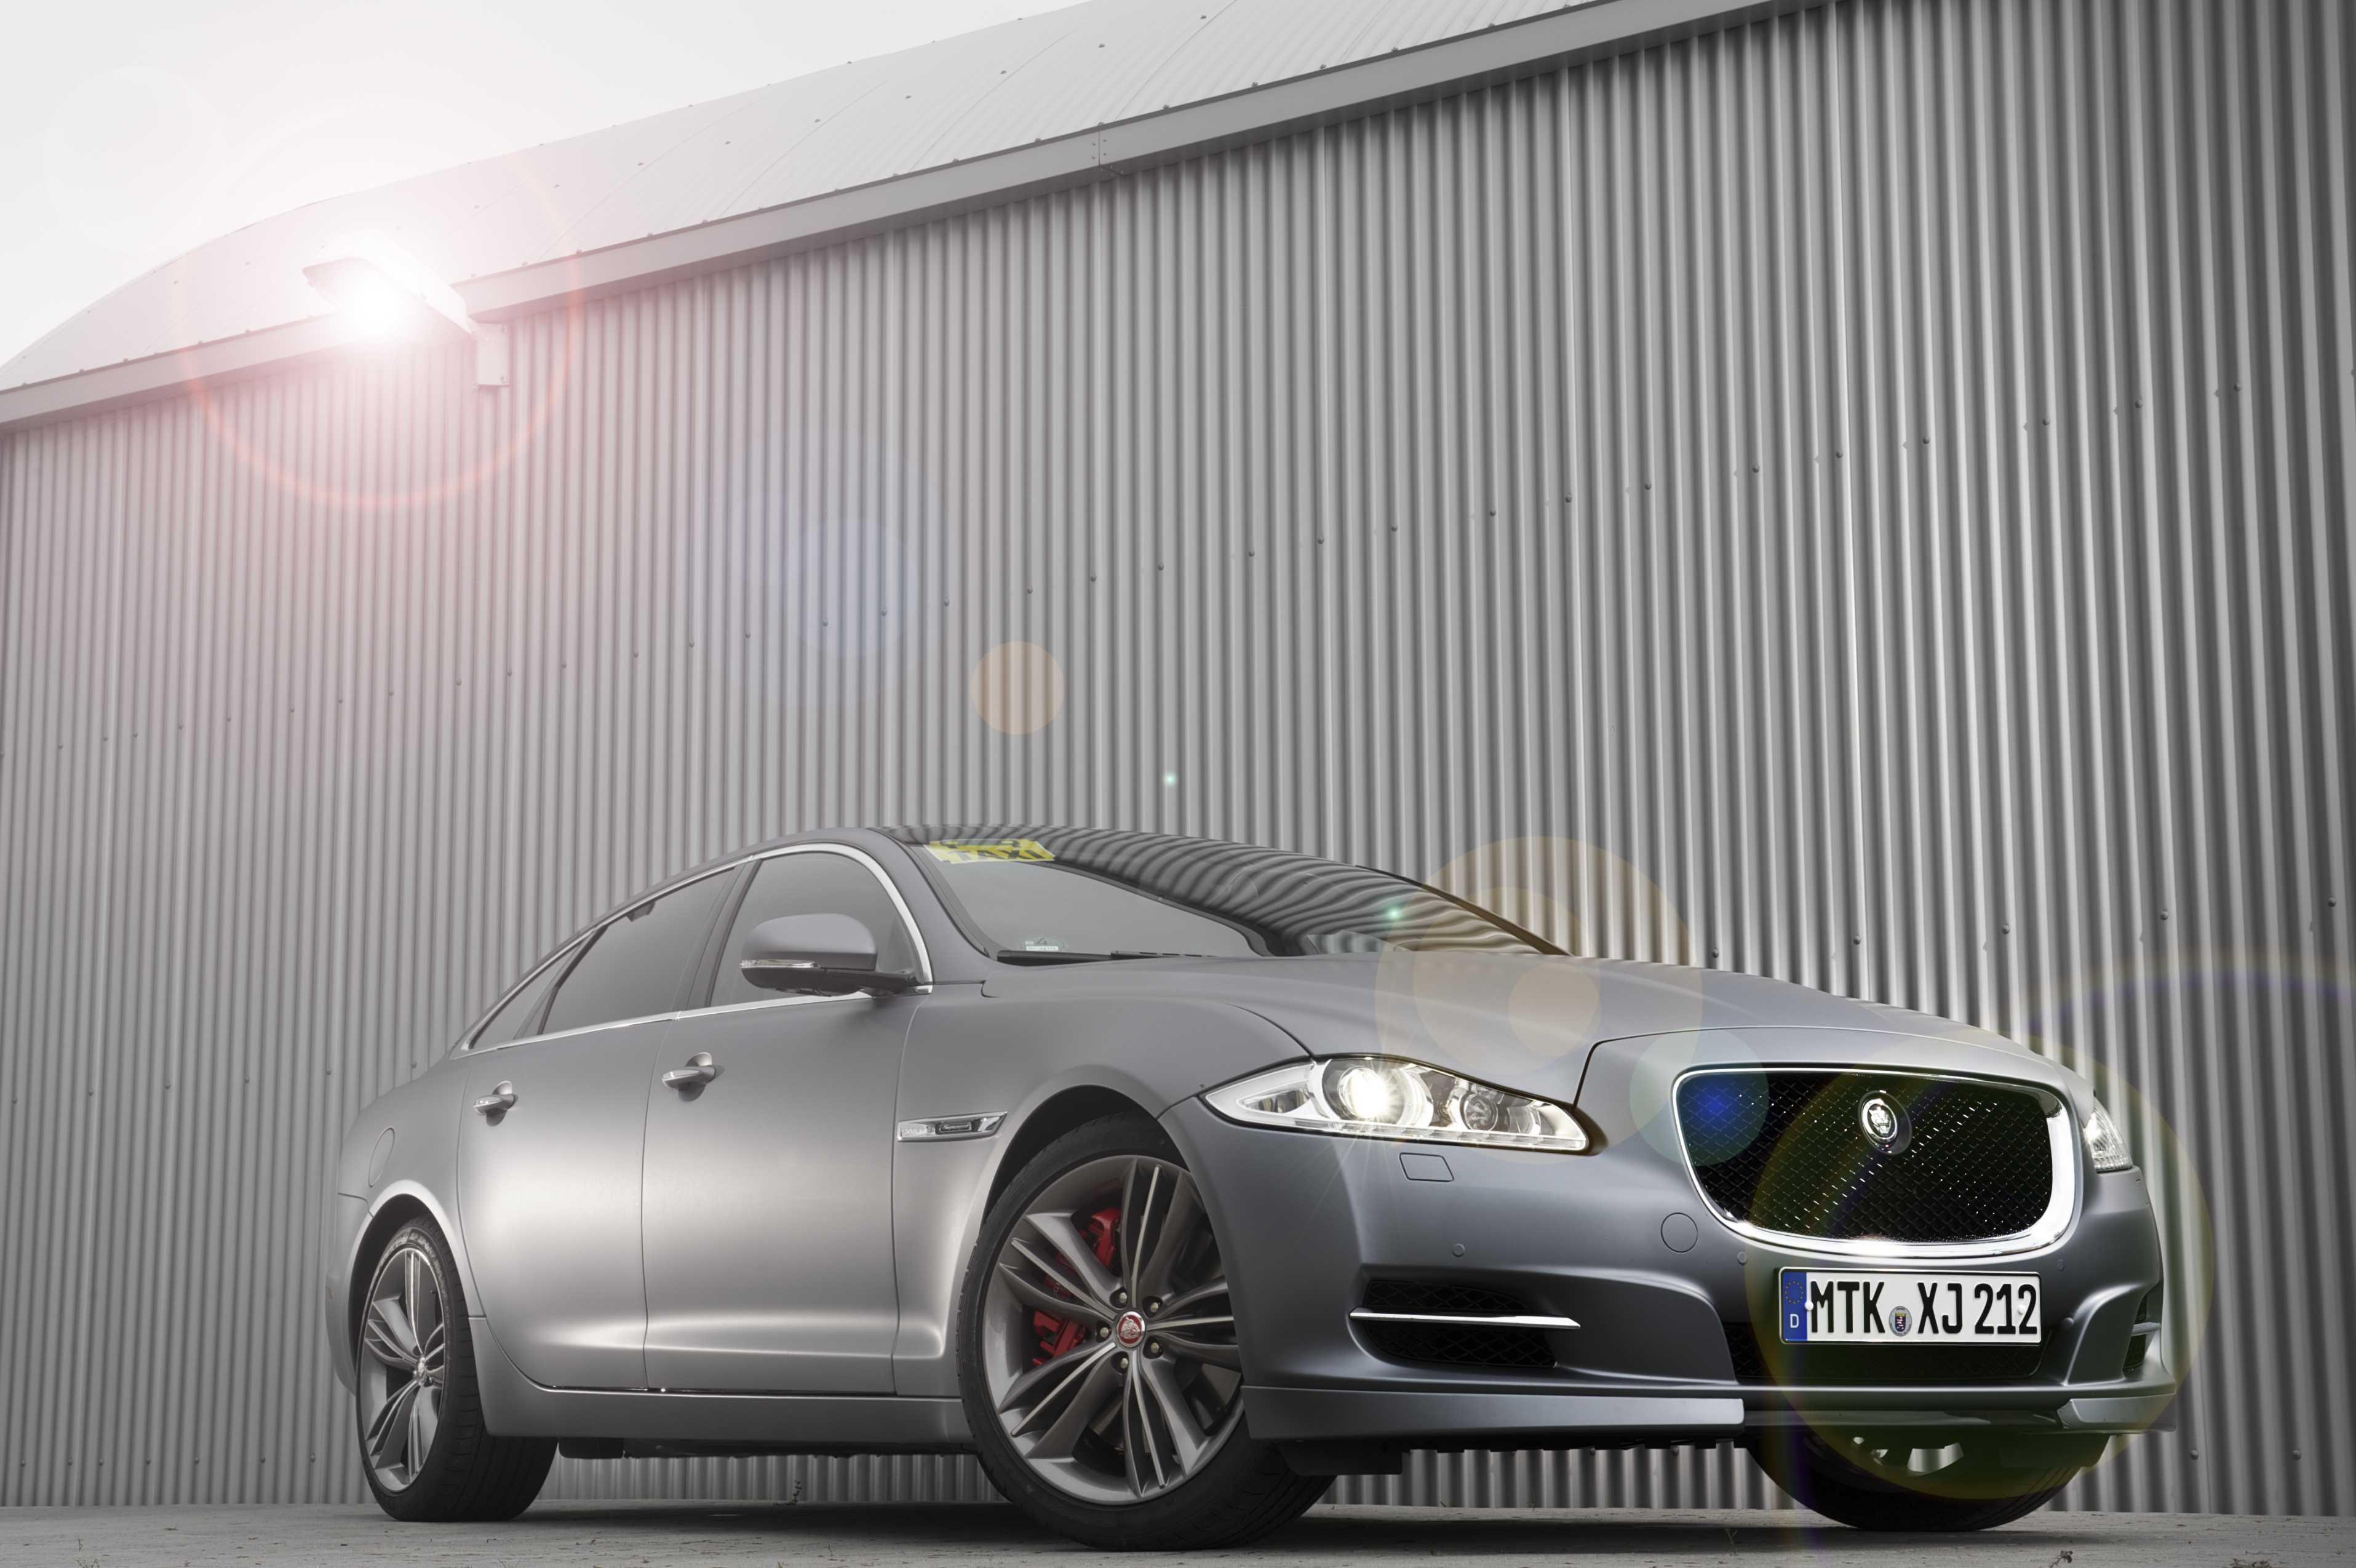 car speed review top xkr cars list jaguar price